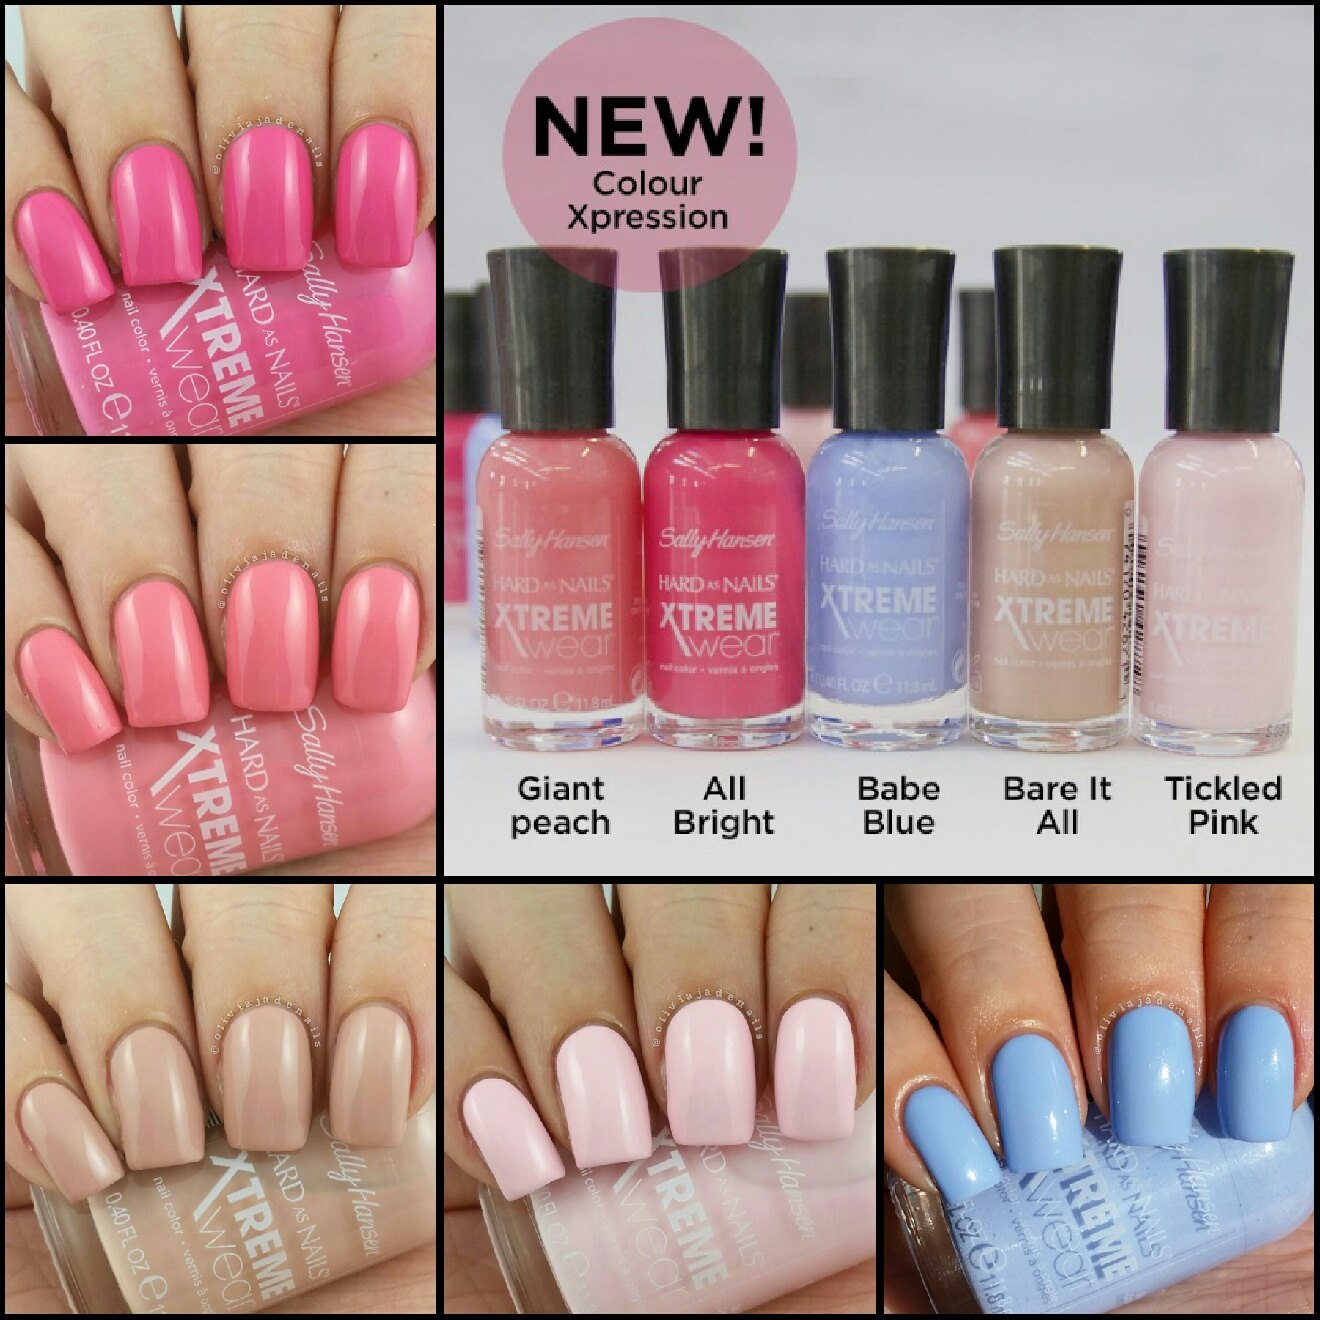 Olivia Jade Nails: Sally Hansen New Xtreme Wear Colour Xpression ...